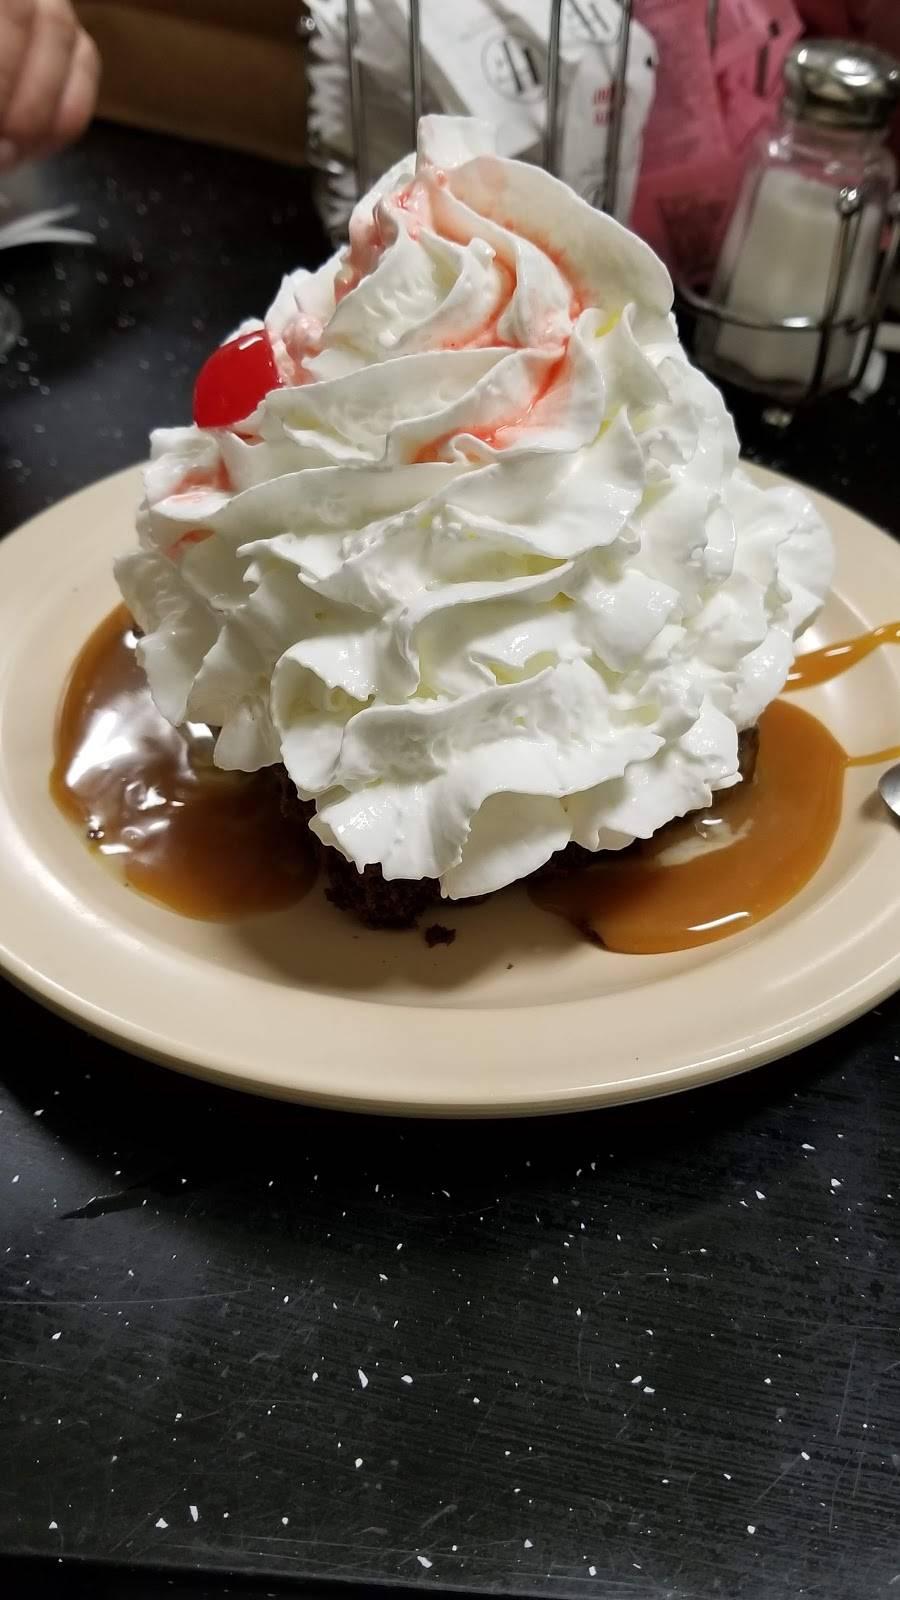 Trowbridges Ice Cream Bar   restaurant   316 N Court St, Florence, AL 35630, USA   2567641503 OR +1 256-764-1503